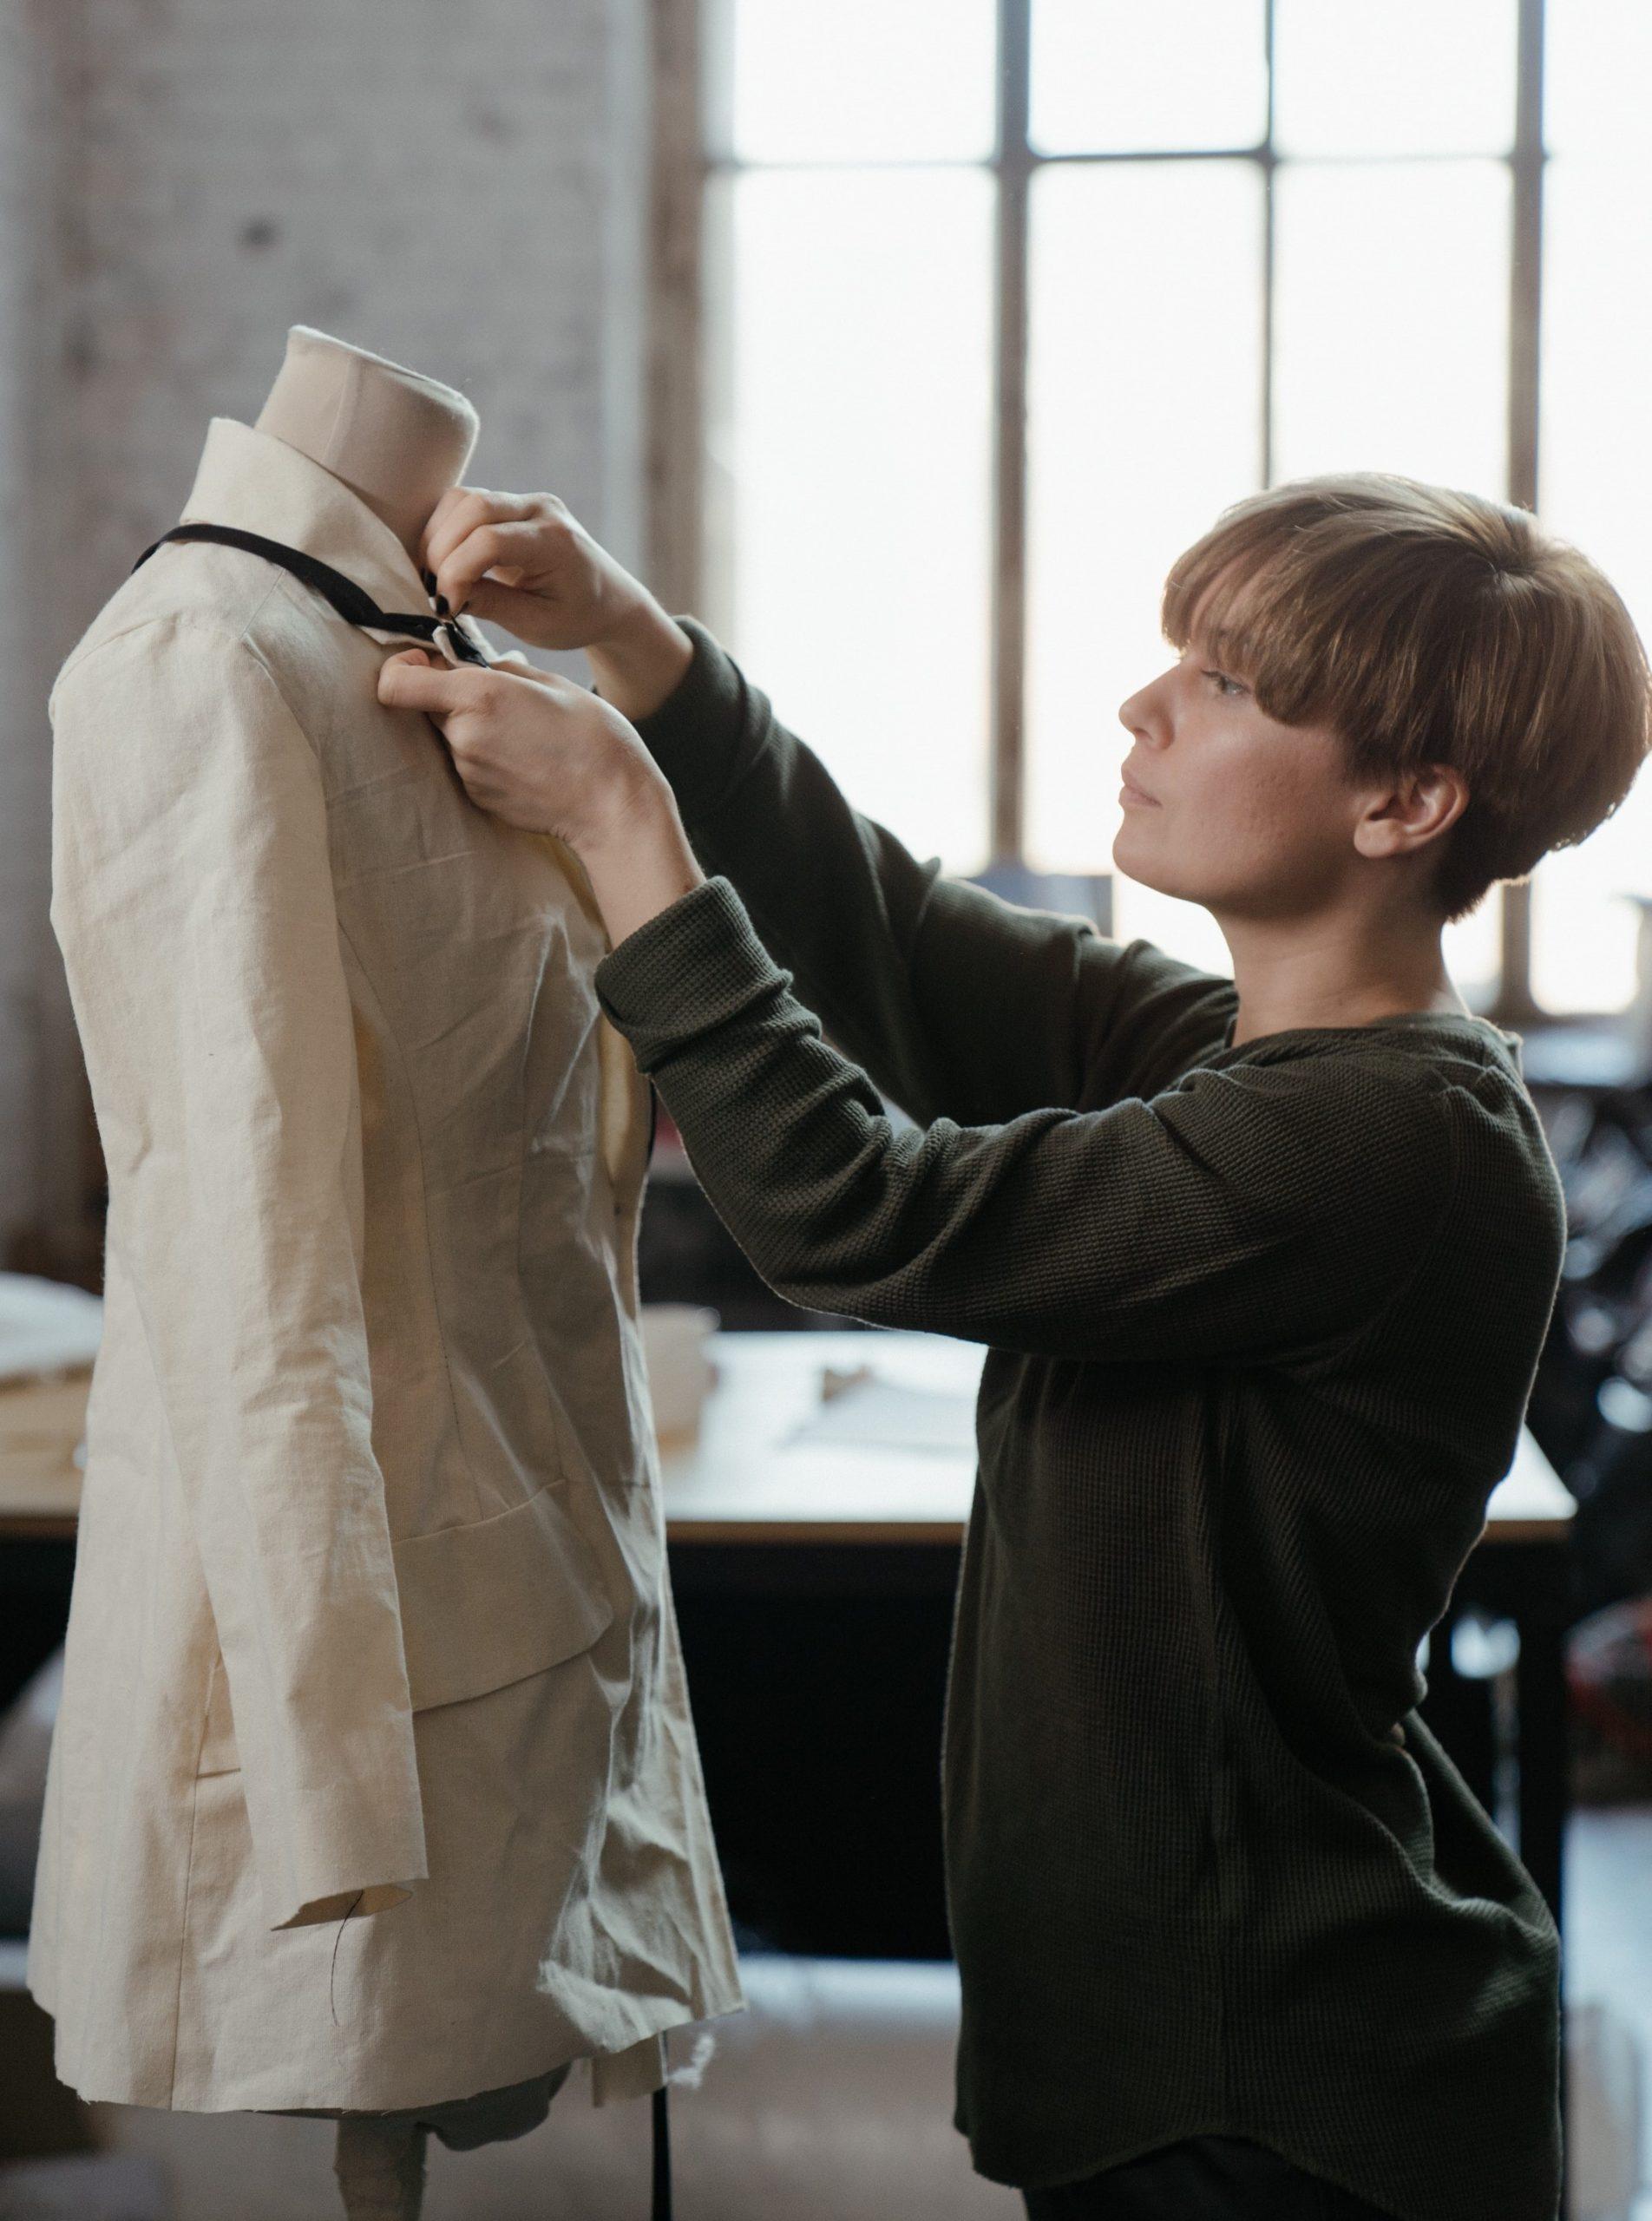 3D Scanning Technology Enables Flexible Garment Production 2